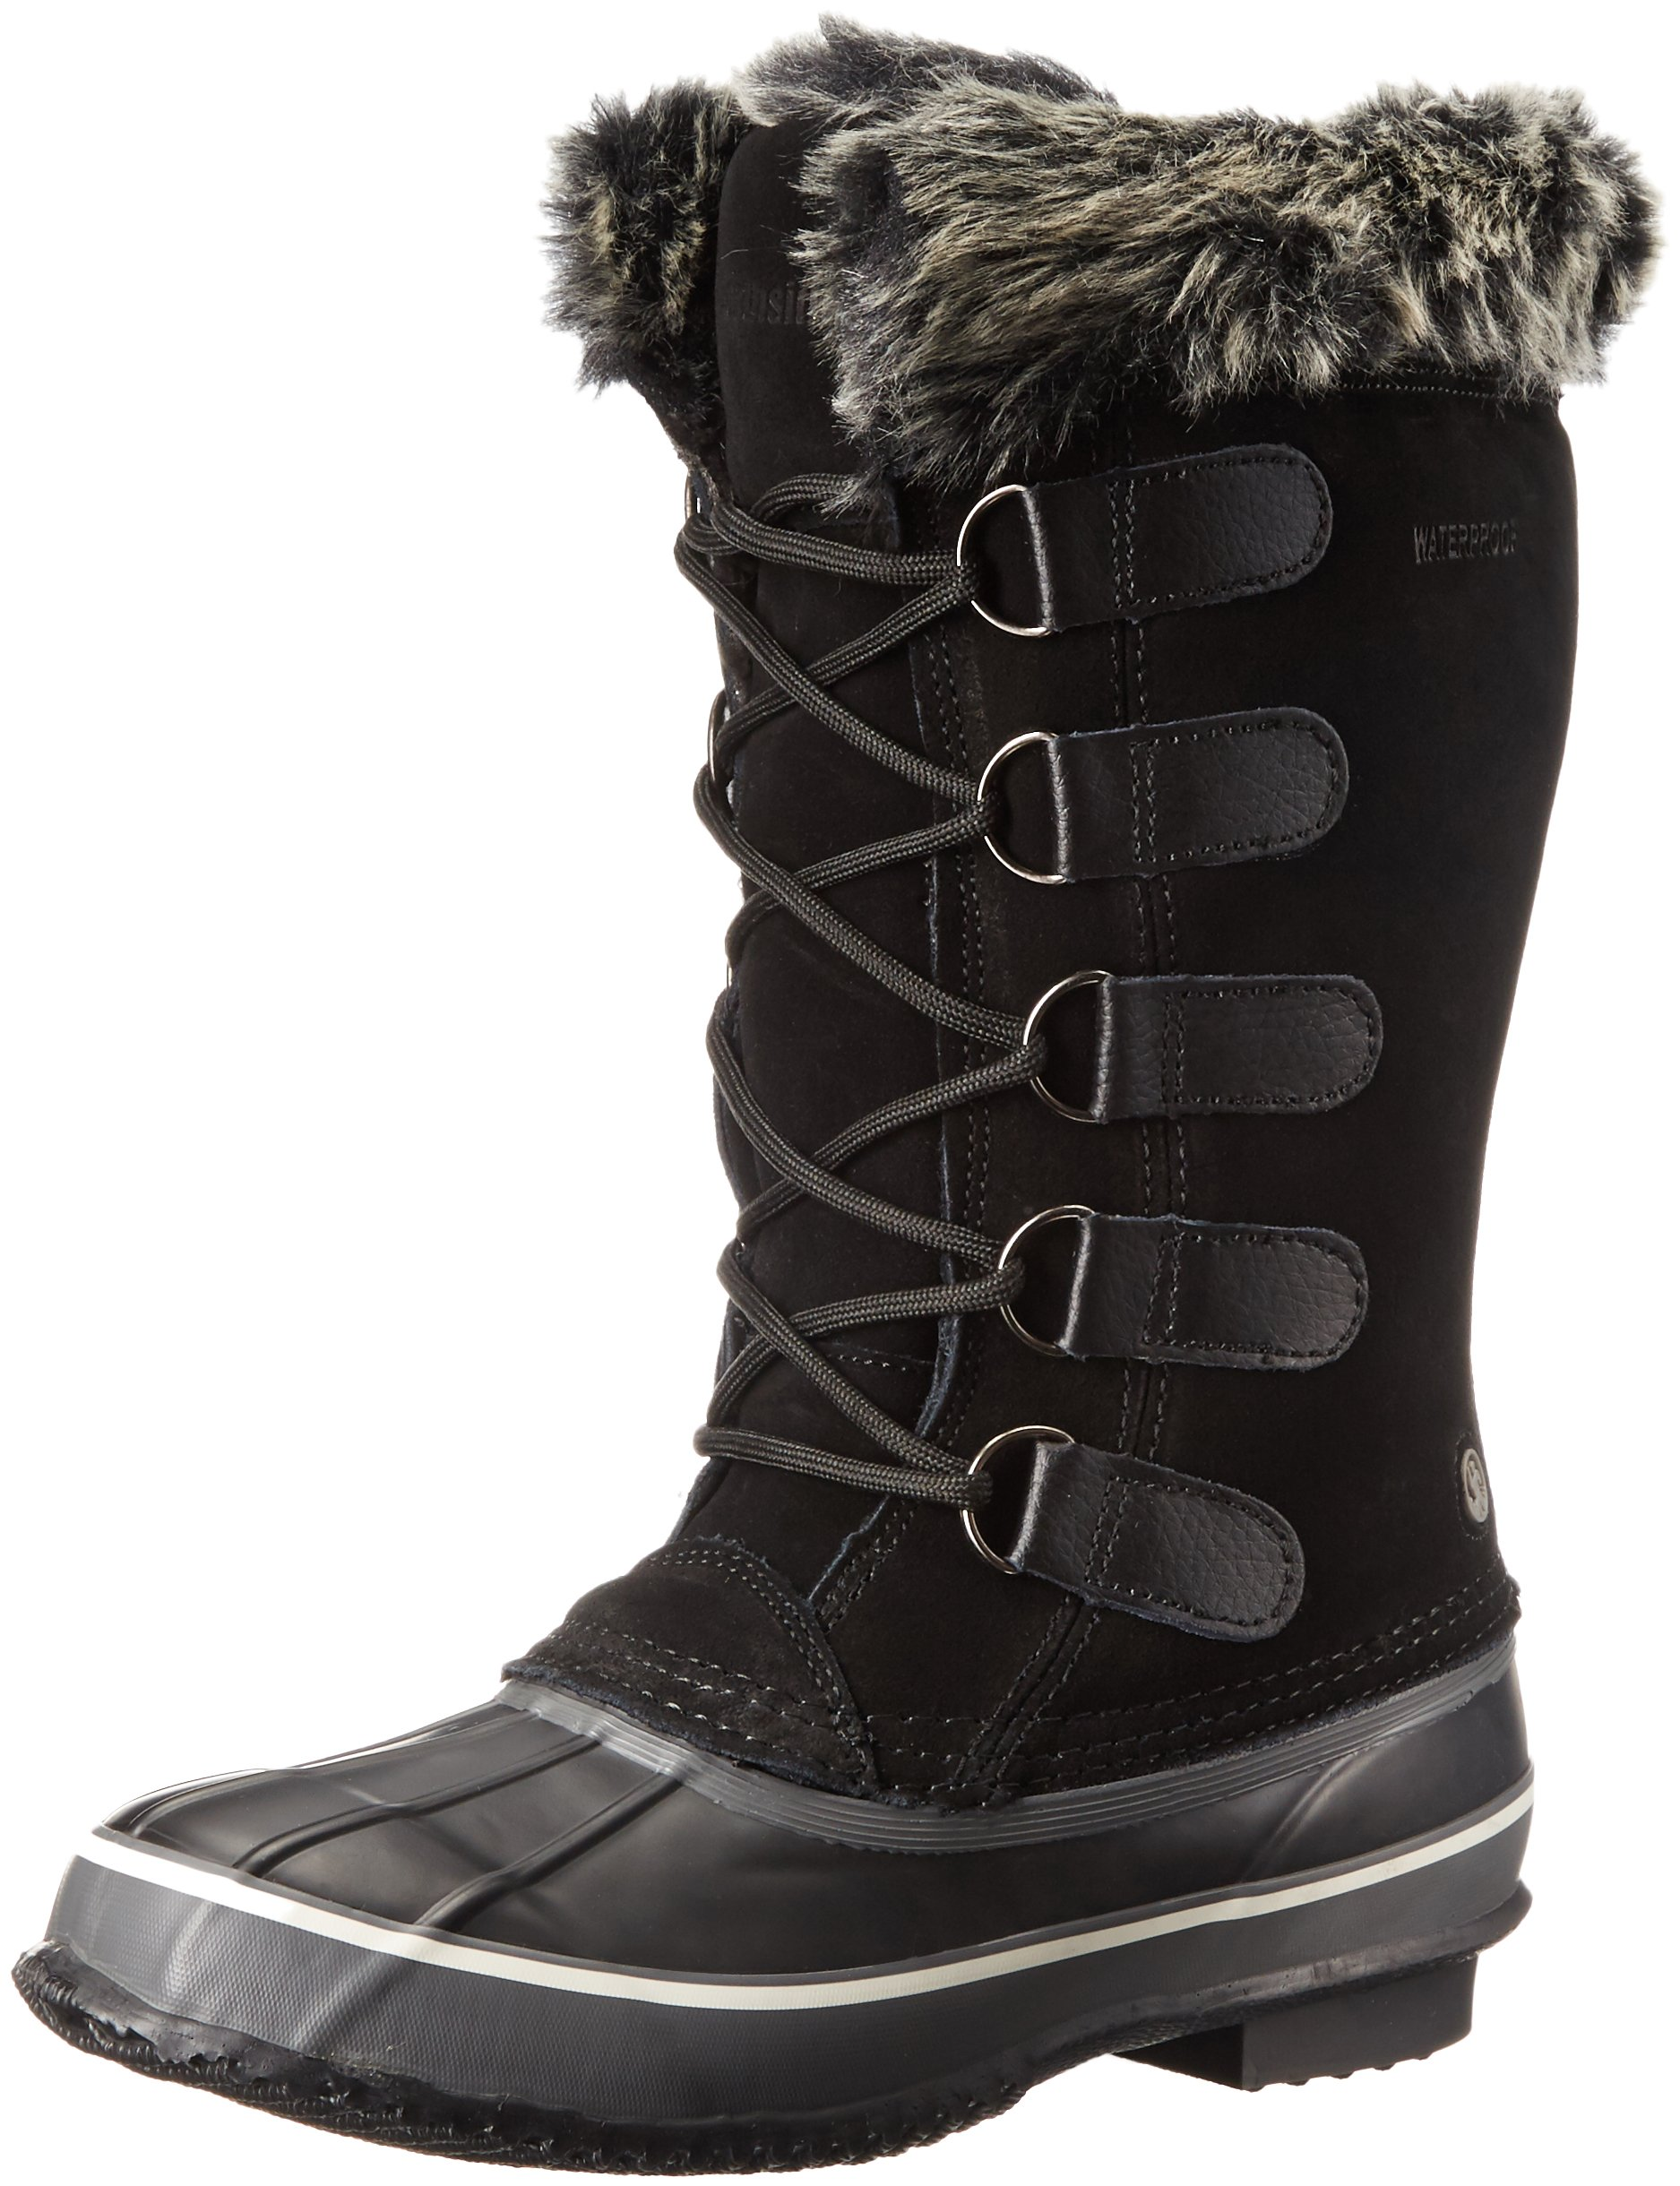 Northside Women's Kathmandu Snow Boot, Onyx, 7 M US